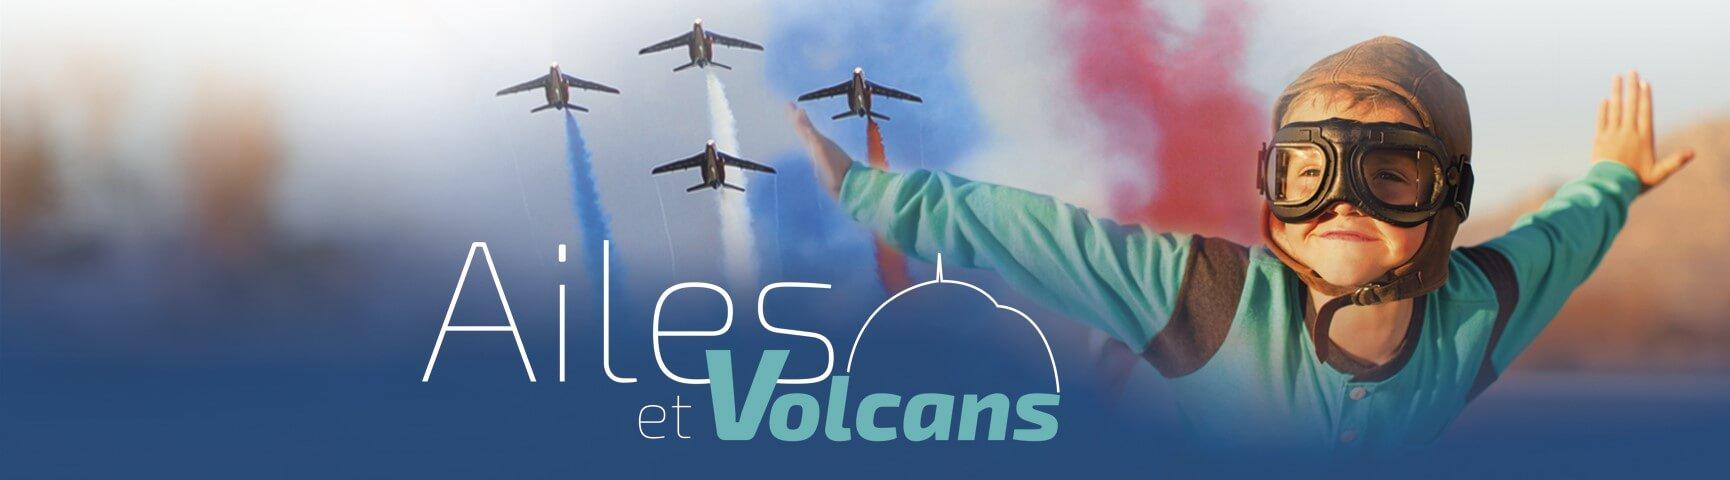 banniere-ailes-volcans